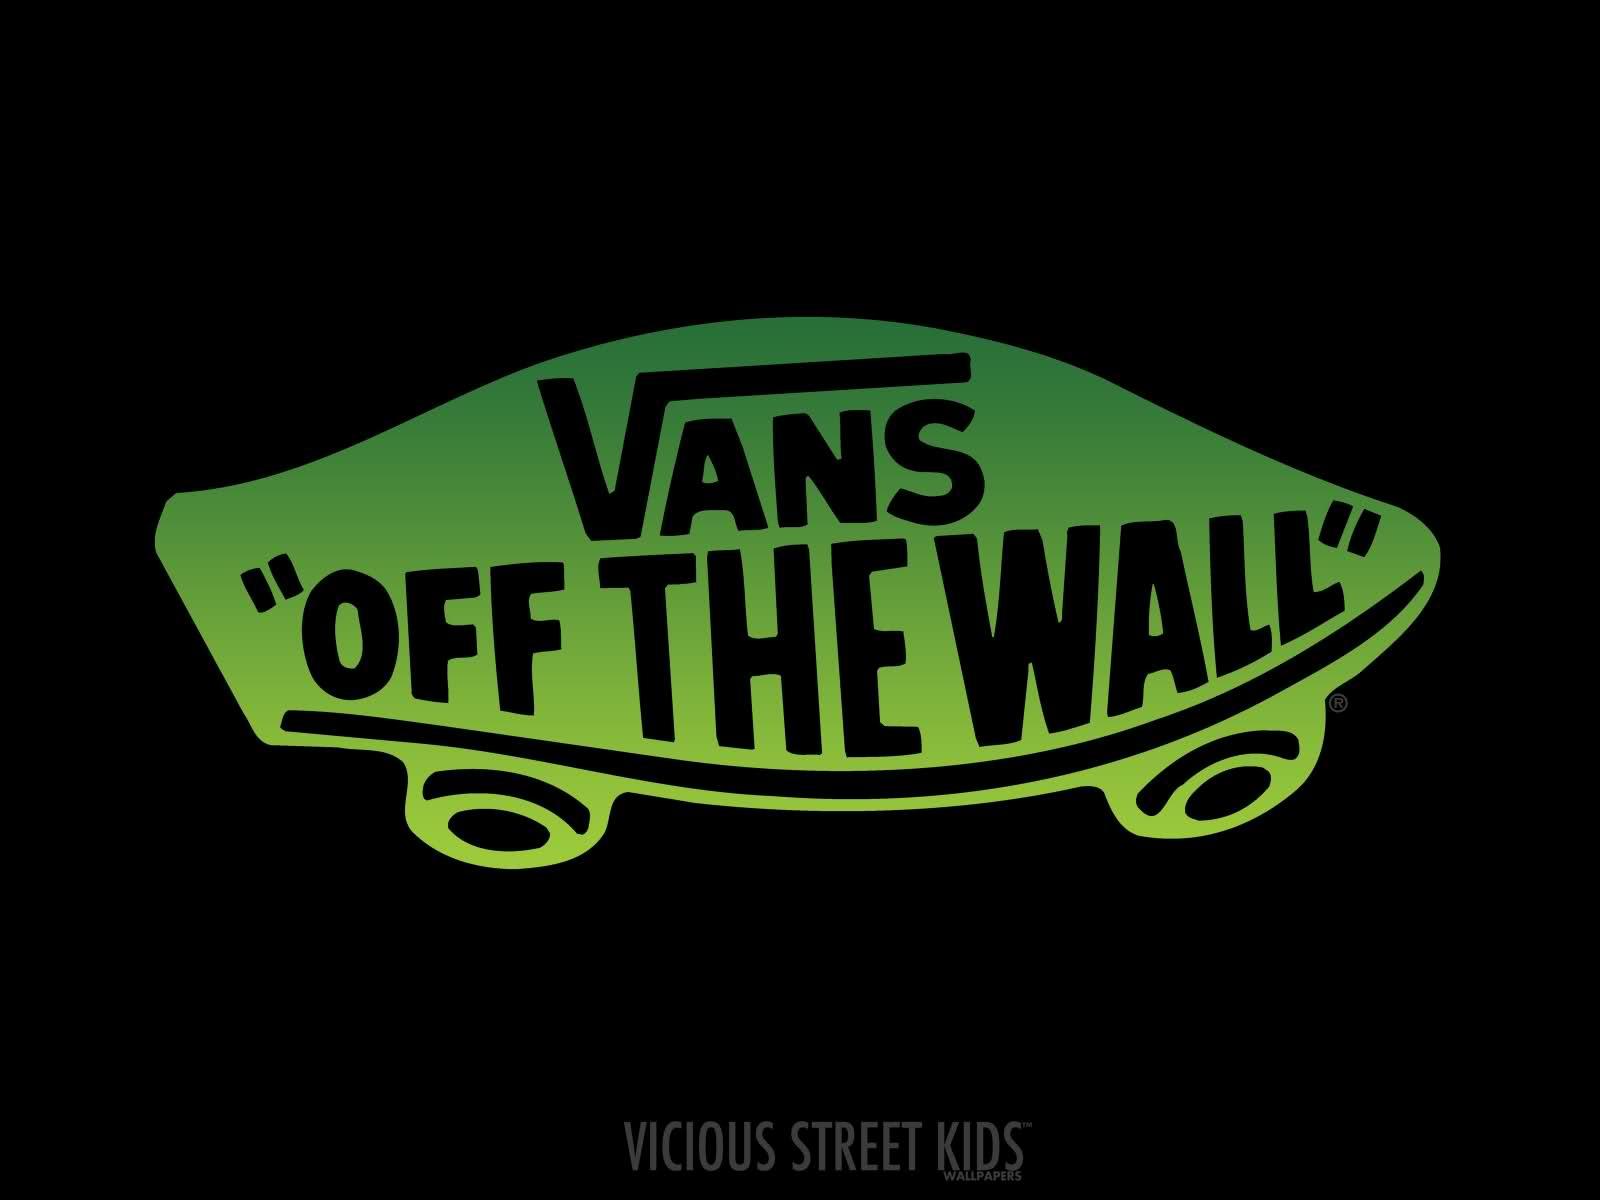 fabc8df80765 1600x1200px Vans Off The Wall Wallpaper - WallpaperSafari